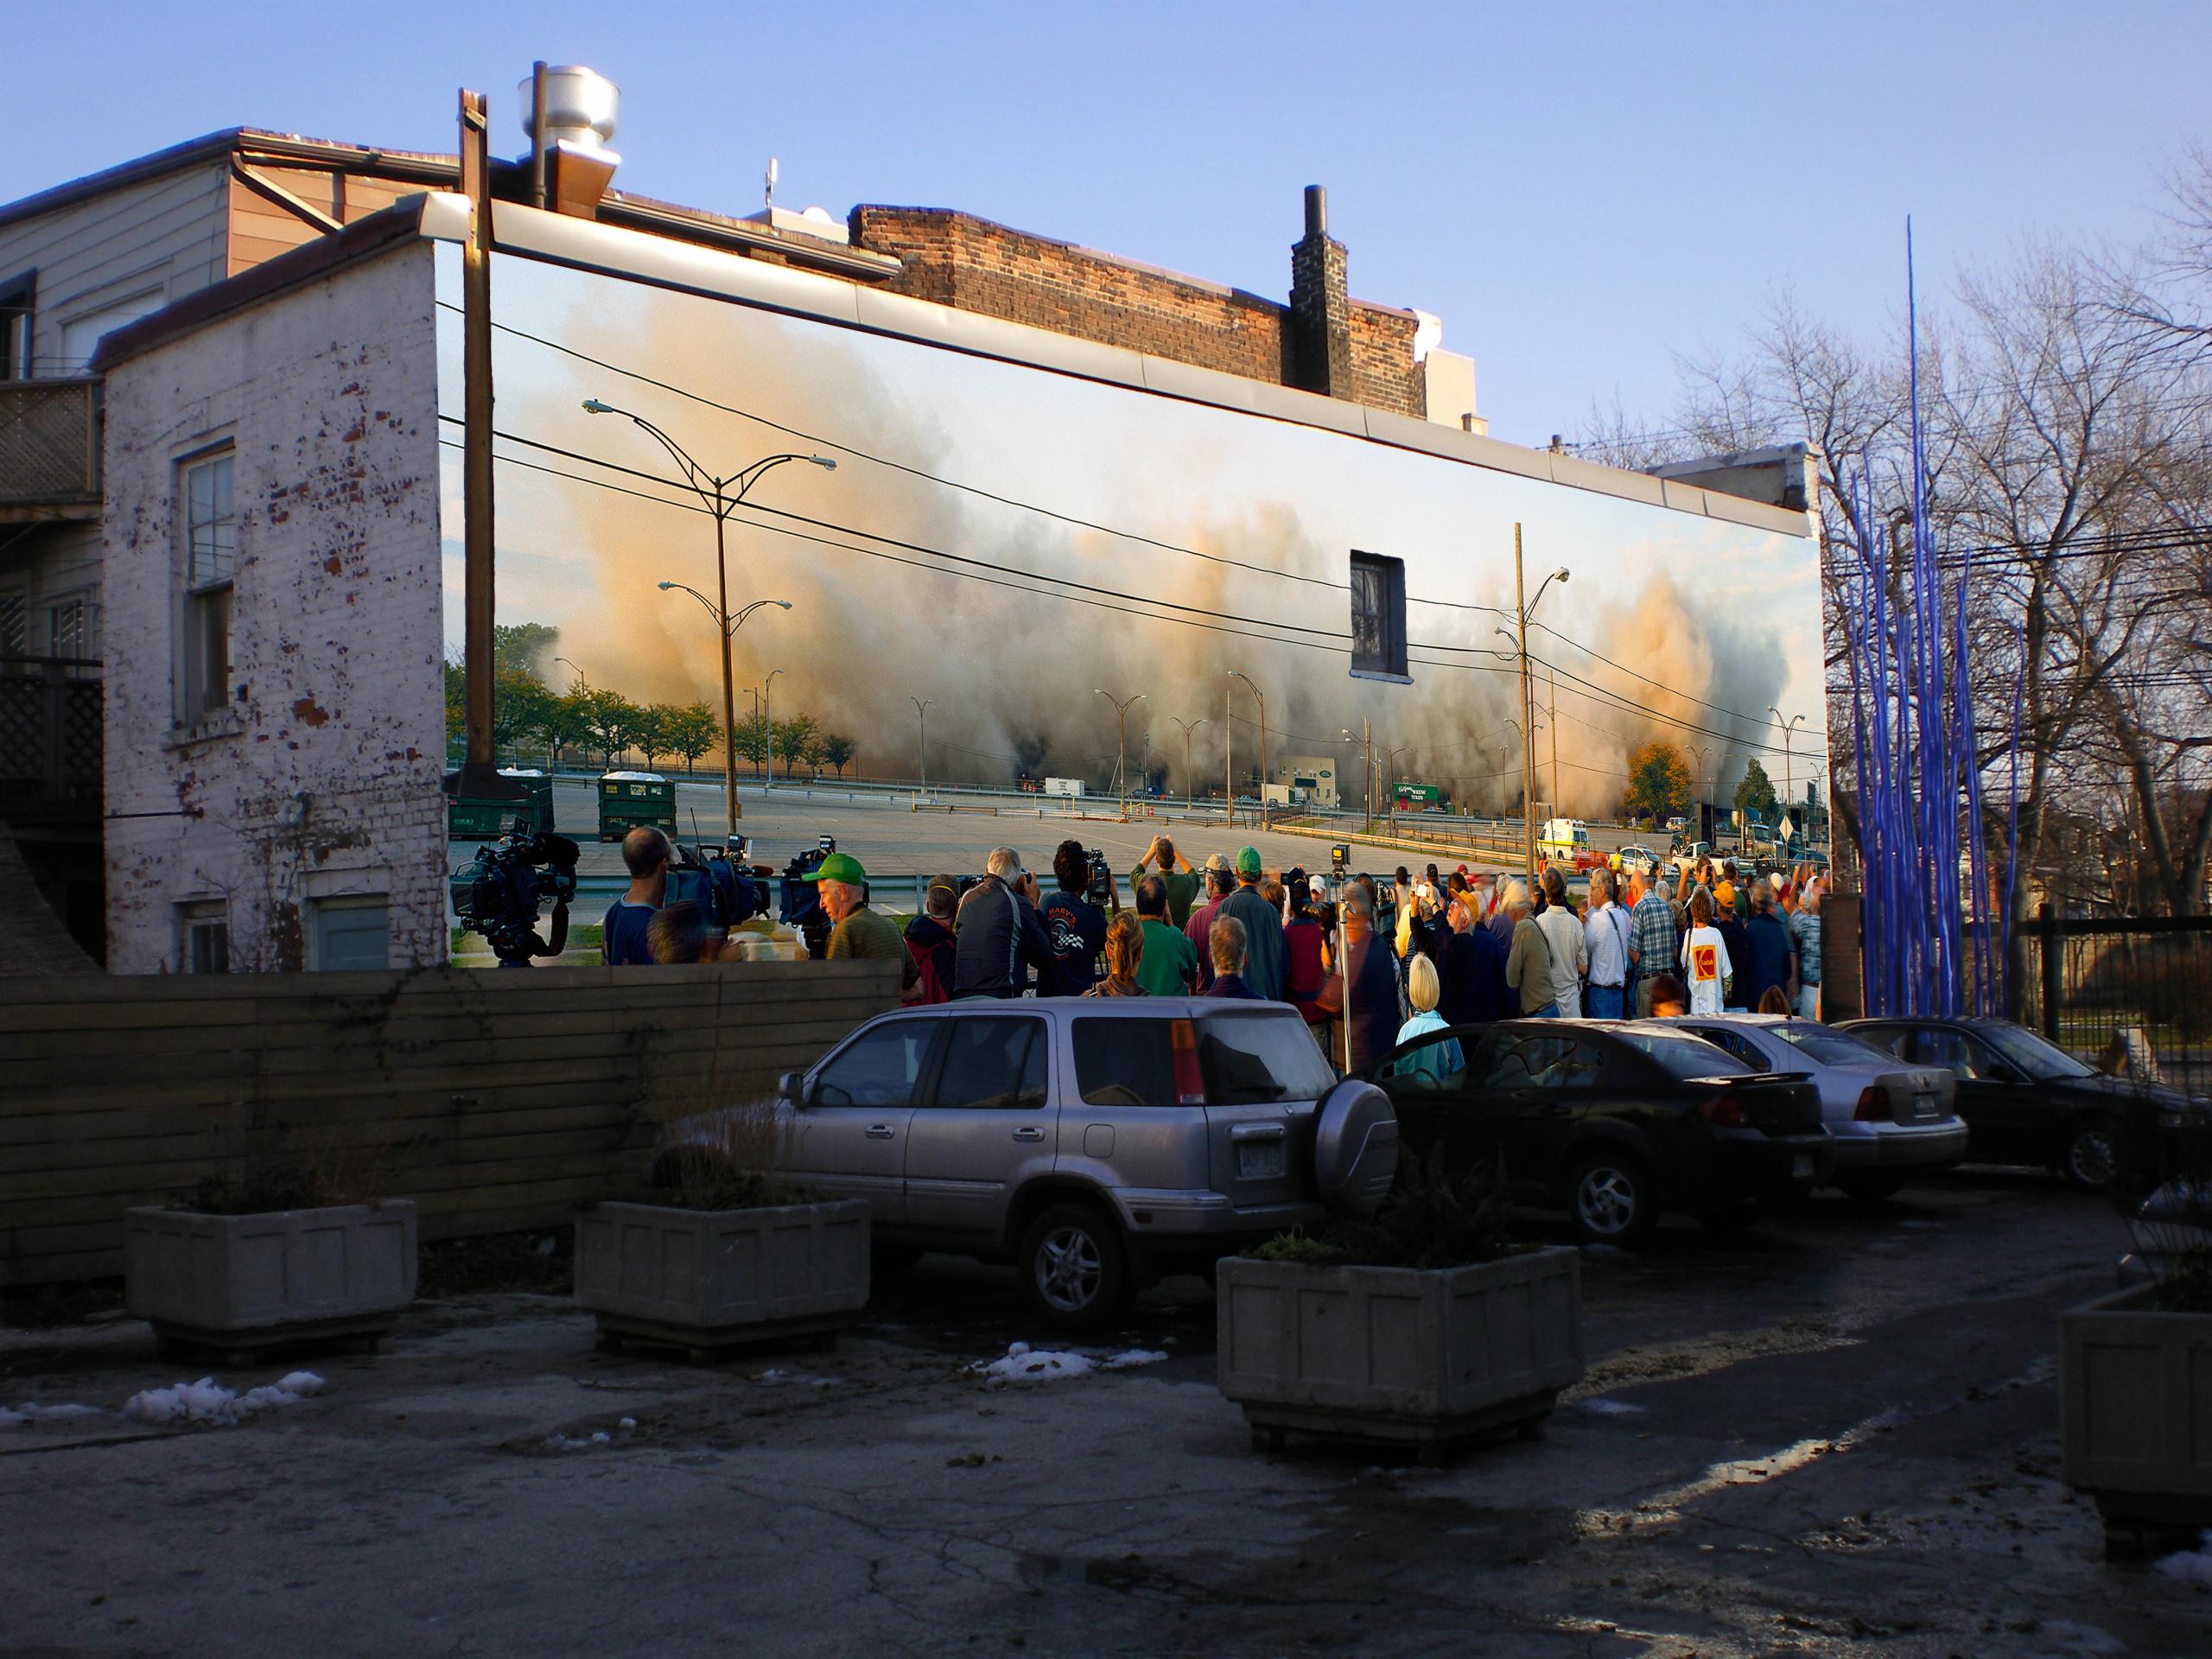 Robert Burley (installation photomontage), Implosion of Buildings #65 & #69, Kodak Park, 2007 (detail)